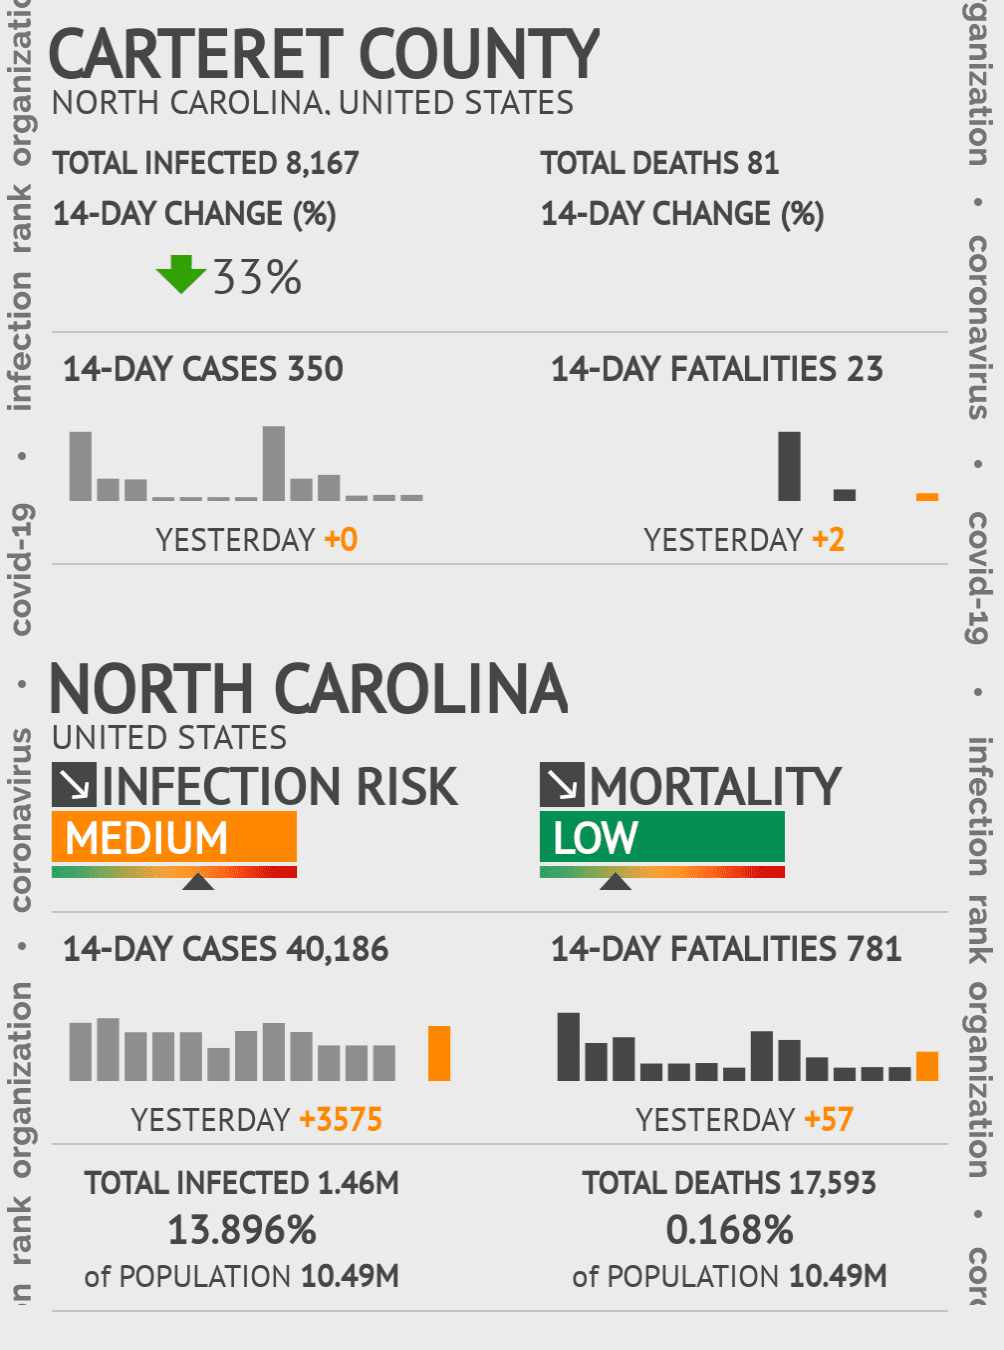 Carteret County Coronavirus Covid-19 Risk of Infection on November 29, 2020